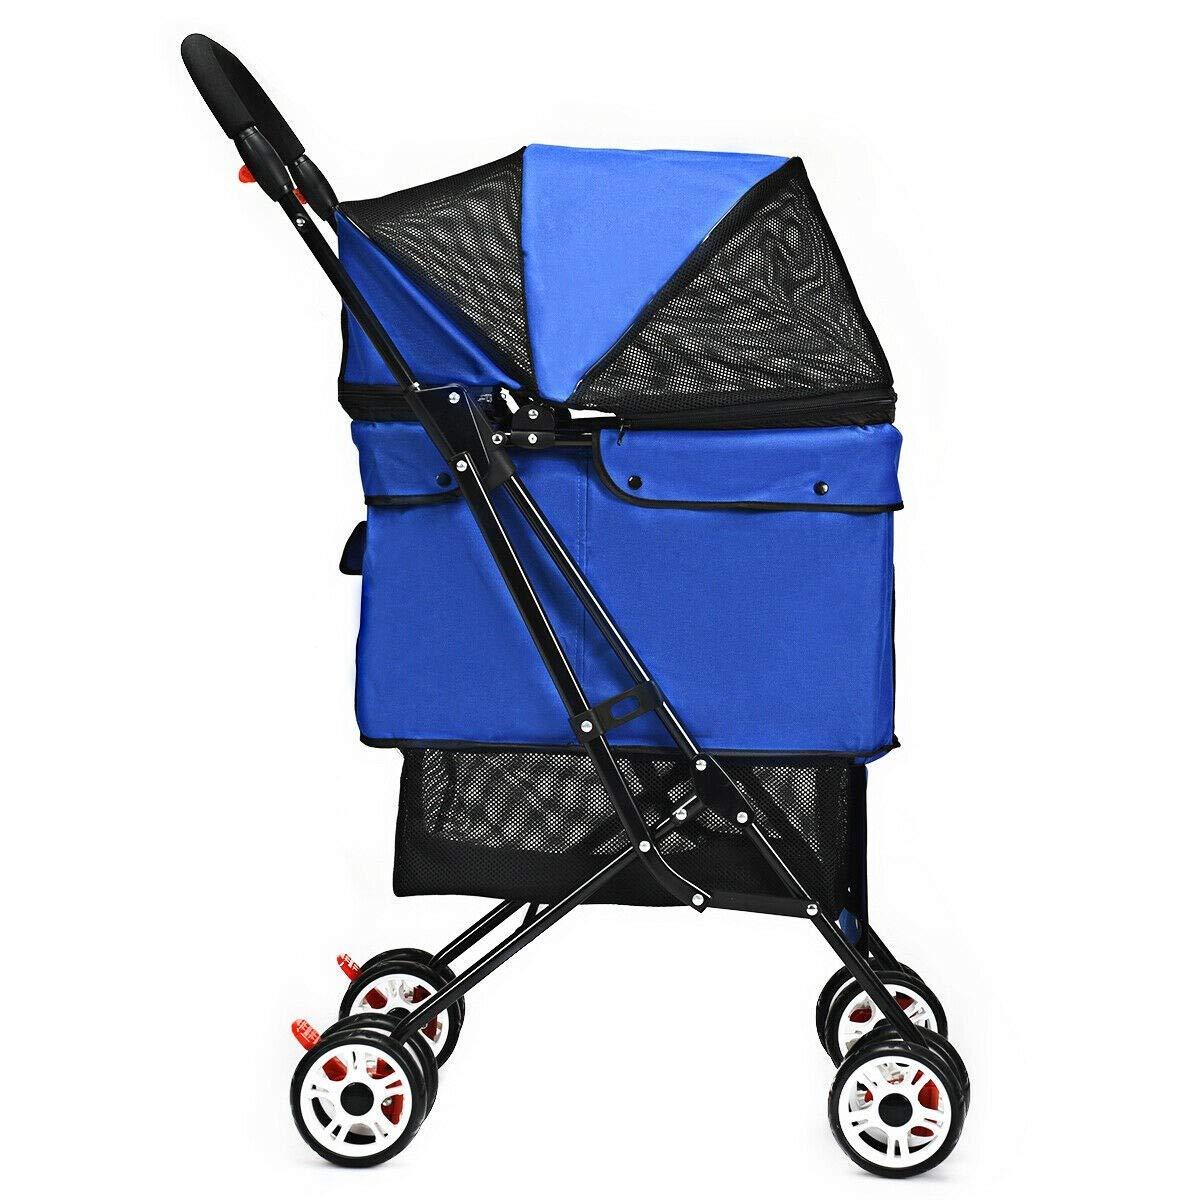 Folding Cat Dog Pets Stroller Carrier Cat Foldable Wheel Cart Walk Jogger Strolling Breathable Durable Outdoor Park Kitten Kitty Puppy (Blue)